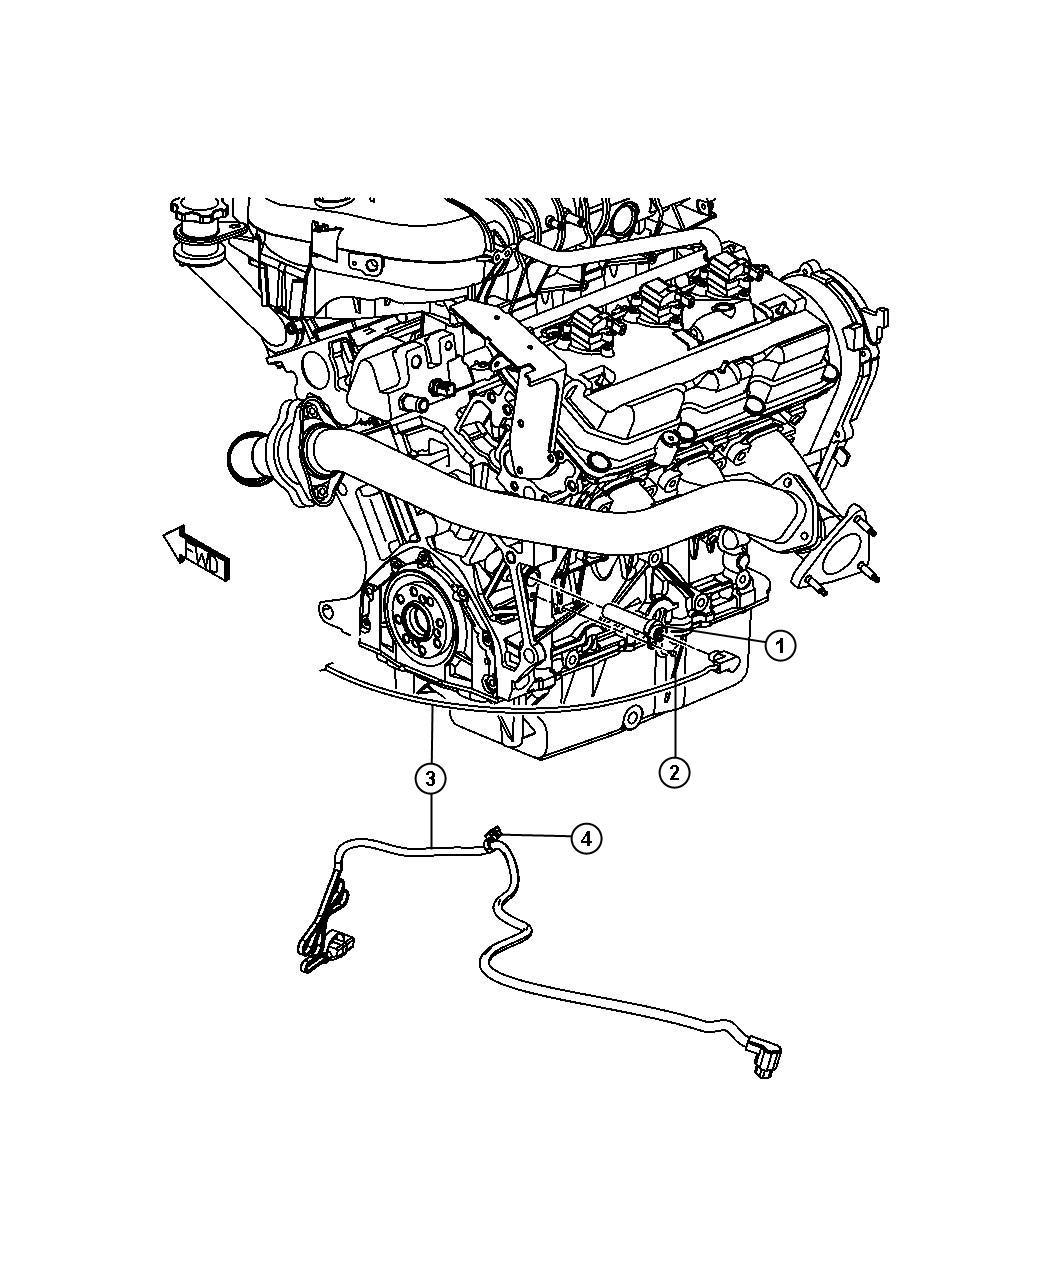 Dodge Sel Engine Block Heater, Dodge, Free Engine Image